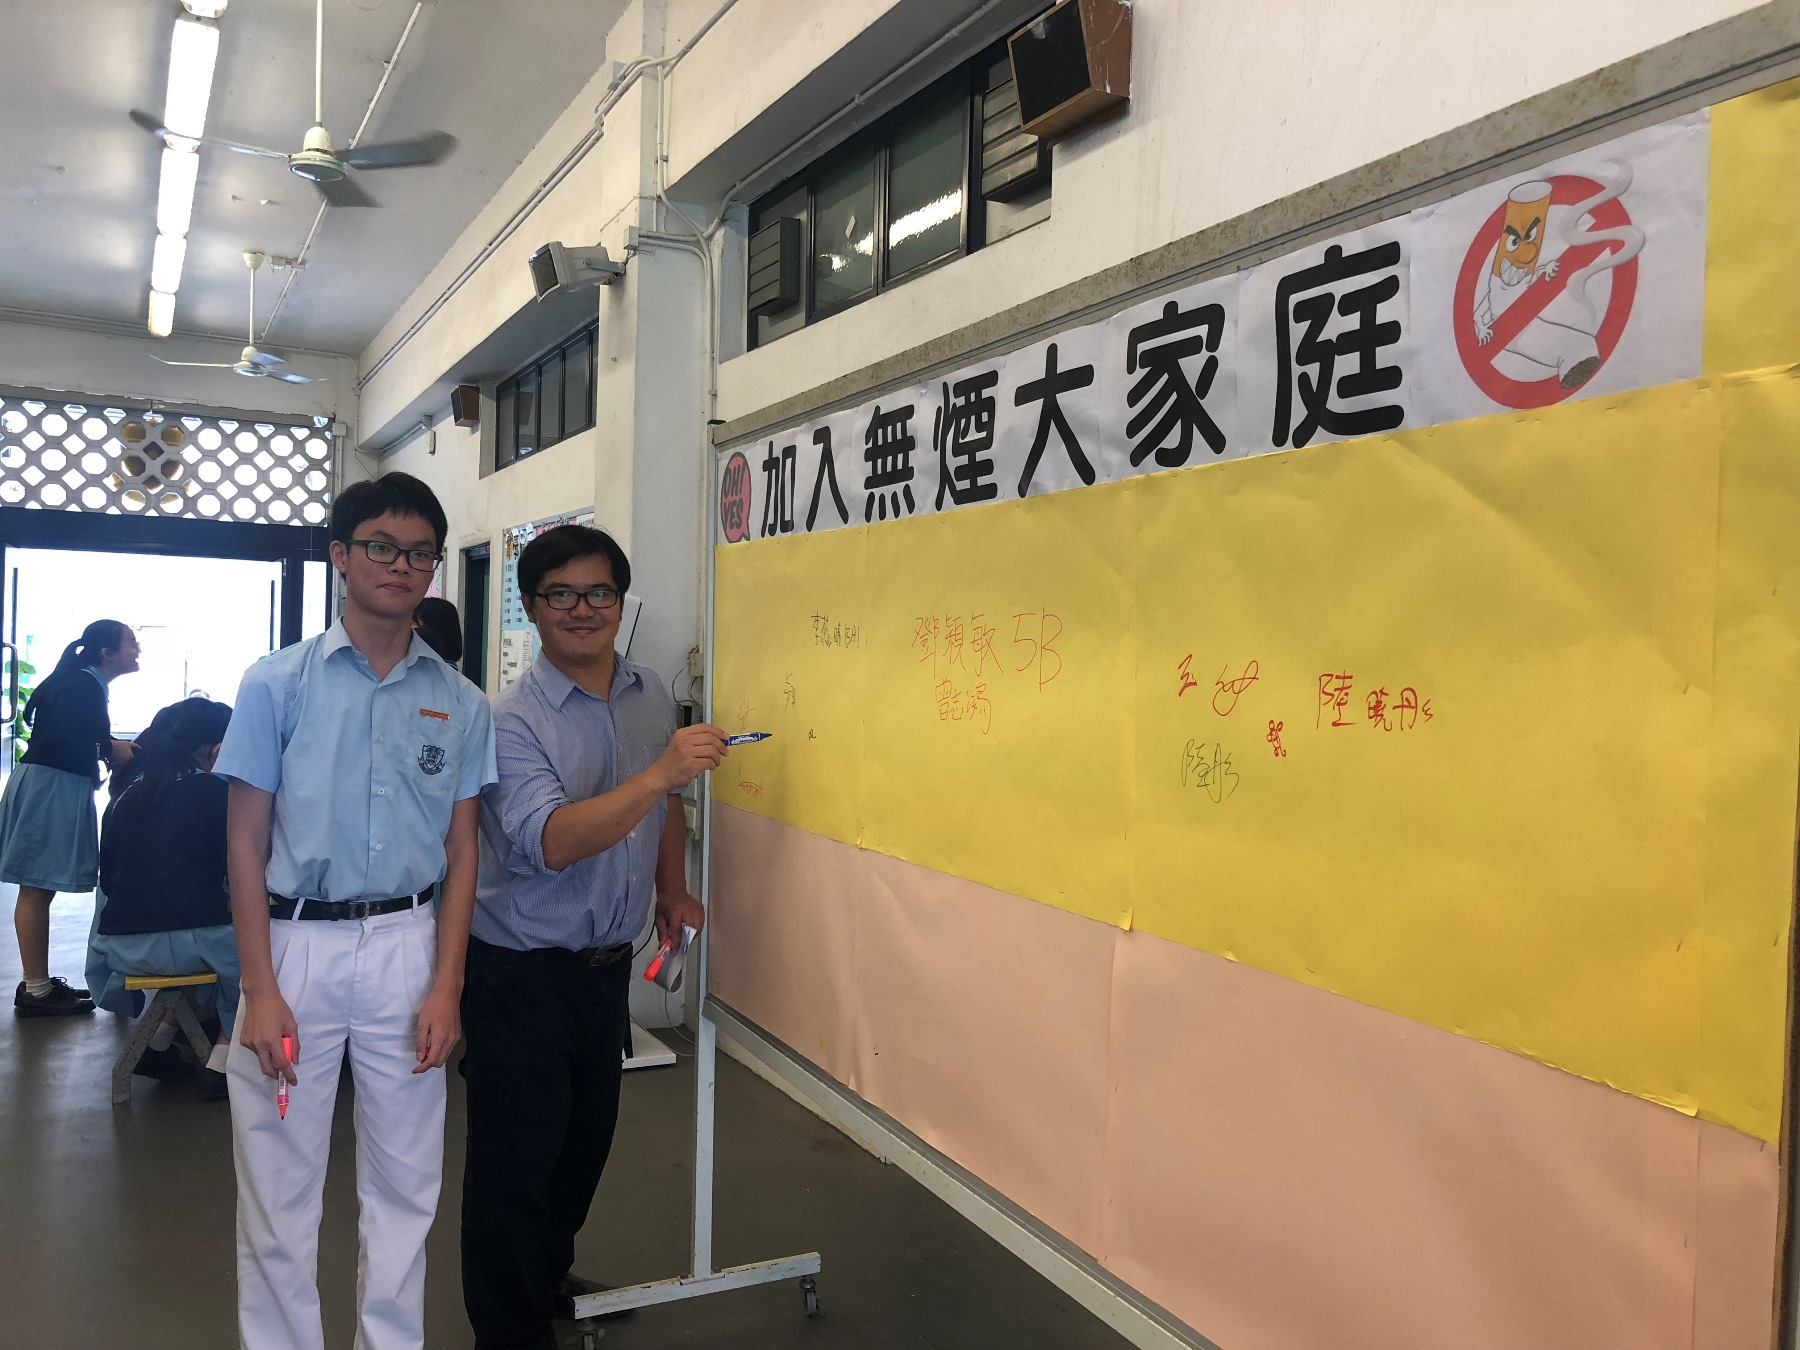 https://npc.edu.hk/sites/default/files/img_8023.jpg